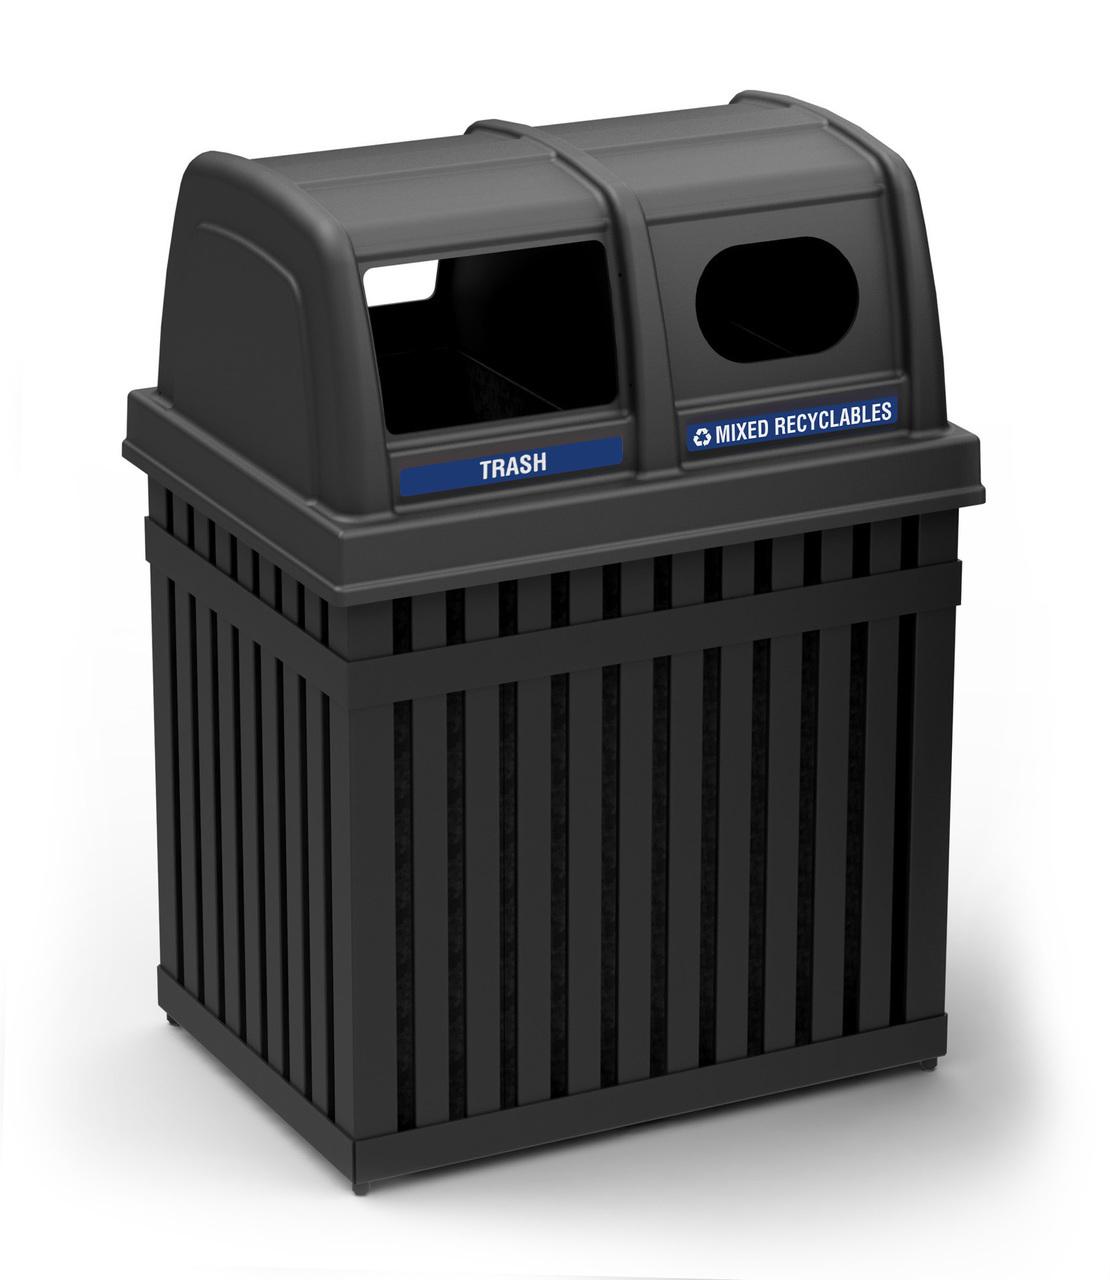 72700199-new-lid-trash-decal-rv02-08-31-2016-3-83938.1484002726.1280.1280.jpg